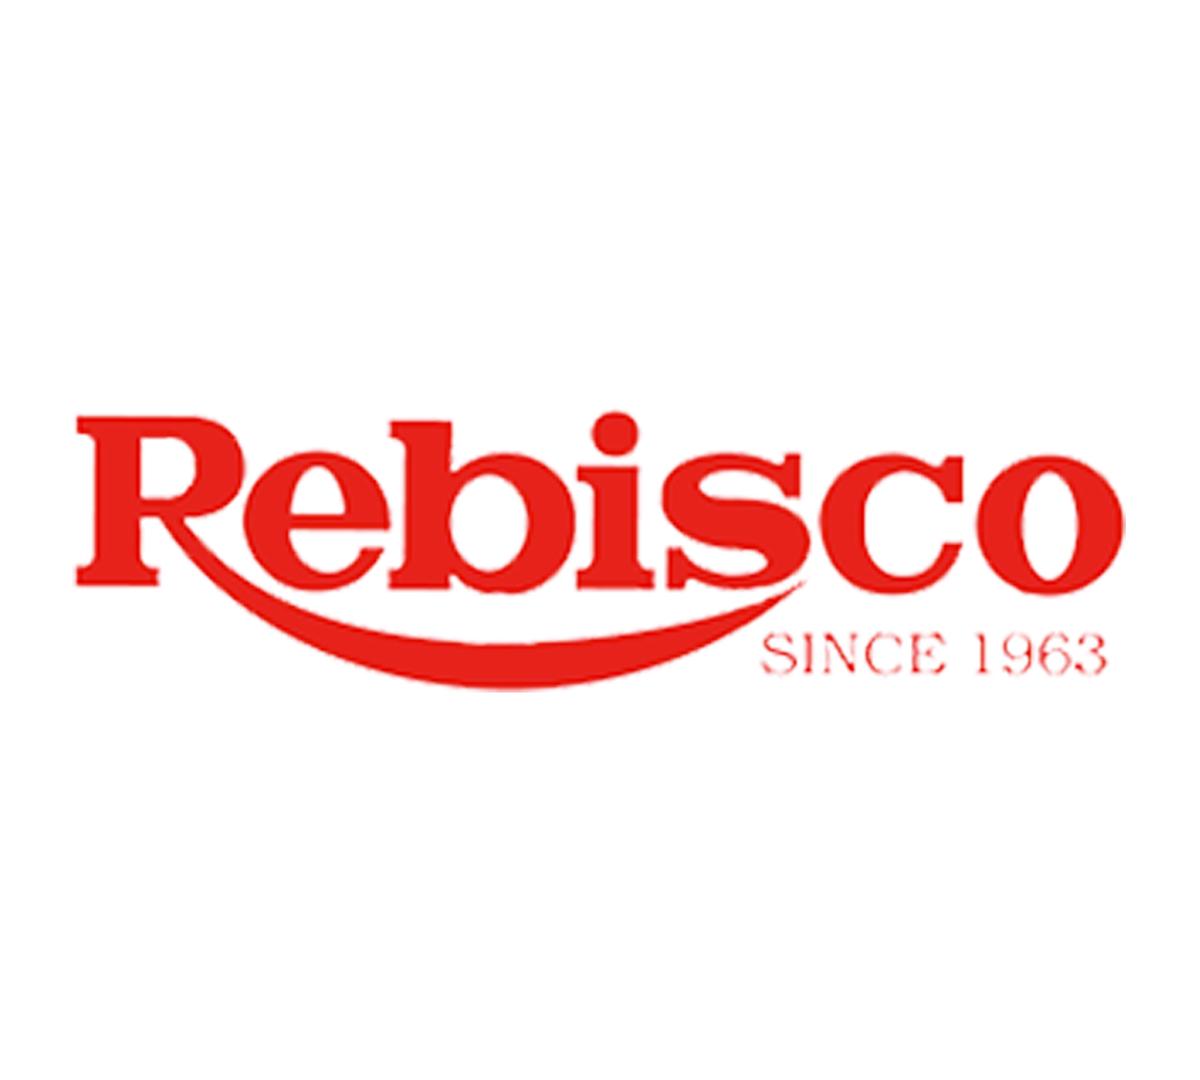 rebisco-logo.png